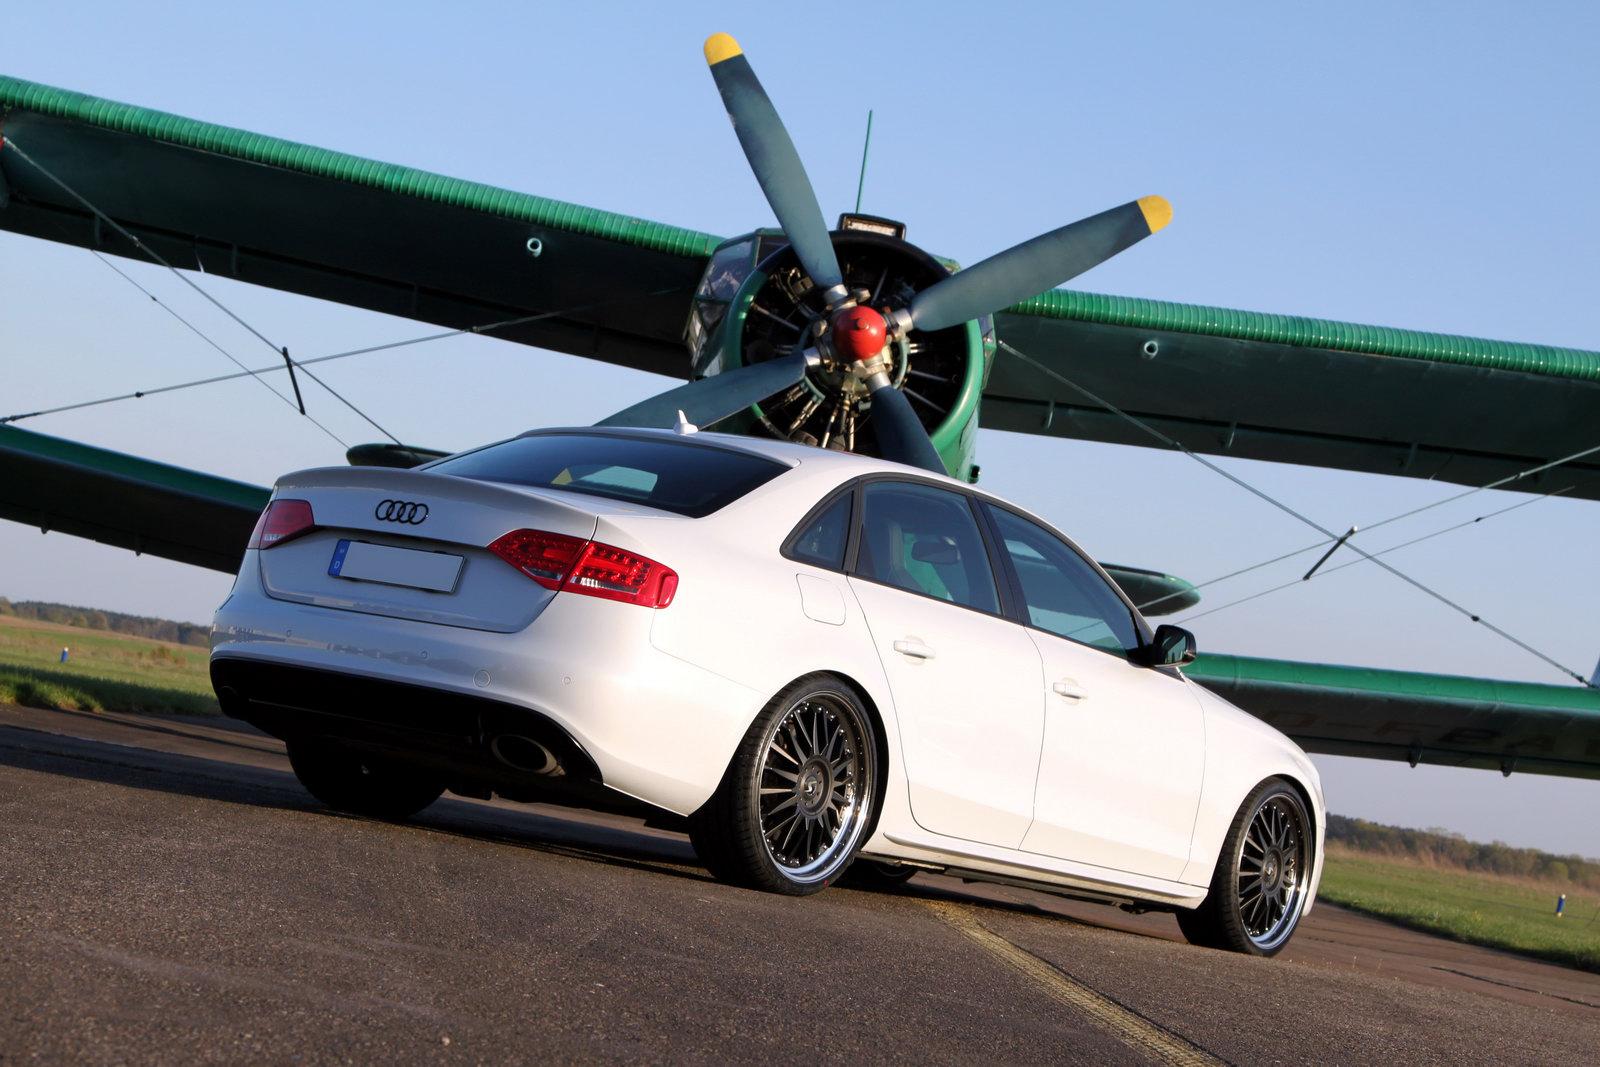 http://1.bp.blogspot.com/_FoXyvaPSnVk/S_LEcB8oleI/AAAAAAAC3J4/IN7061G4nPc/s1600/Audi-S4-Avus-2.JPG